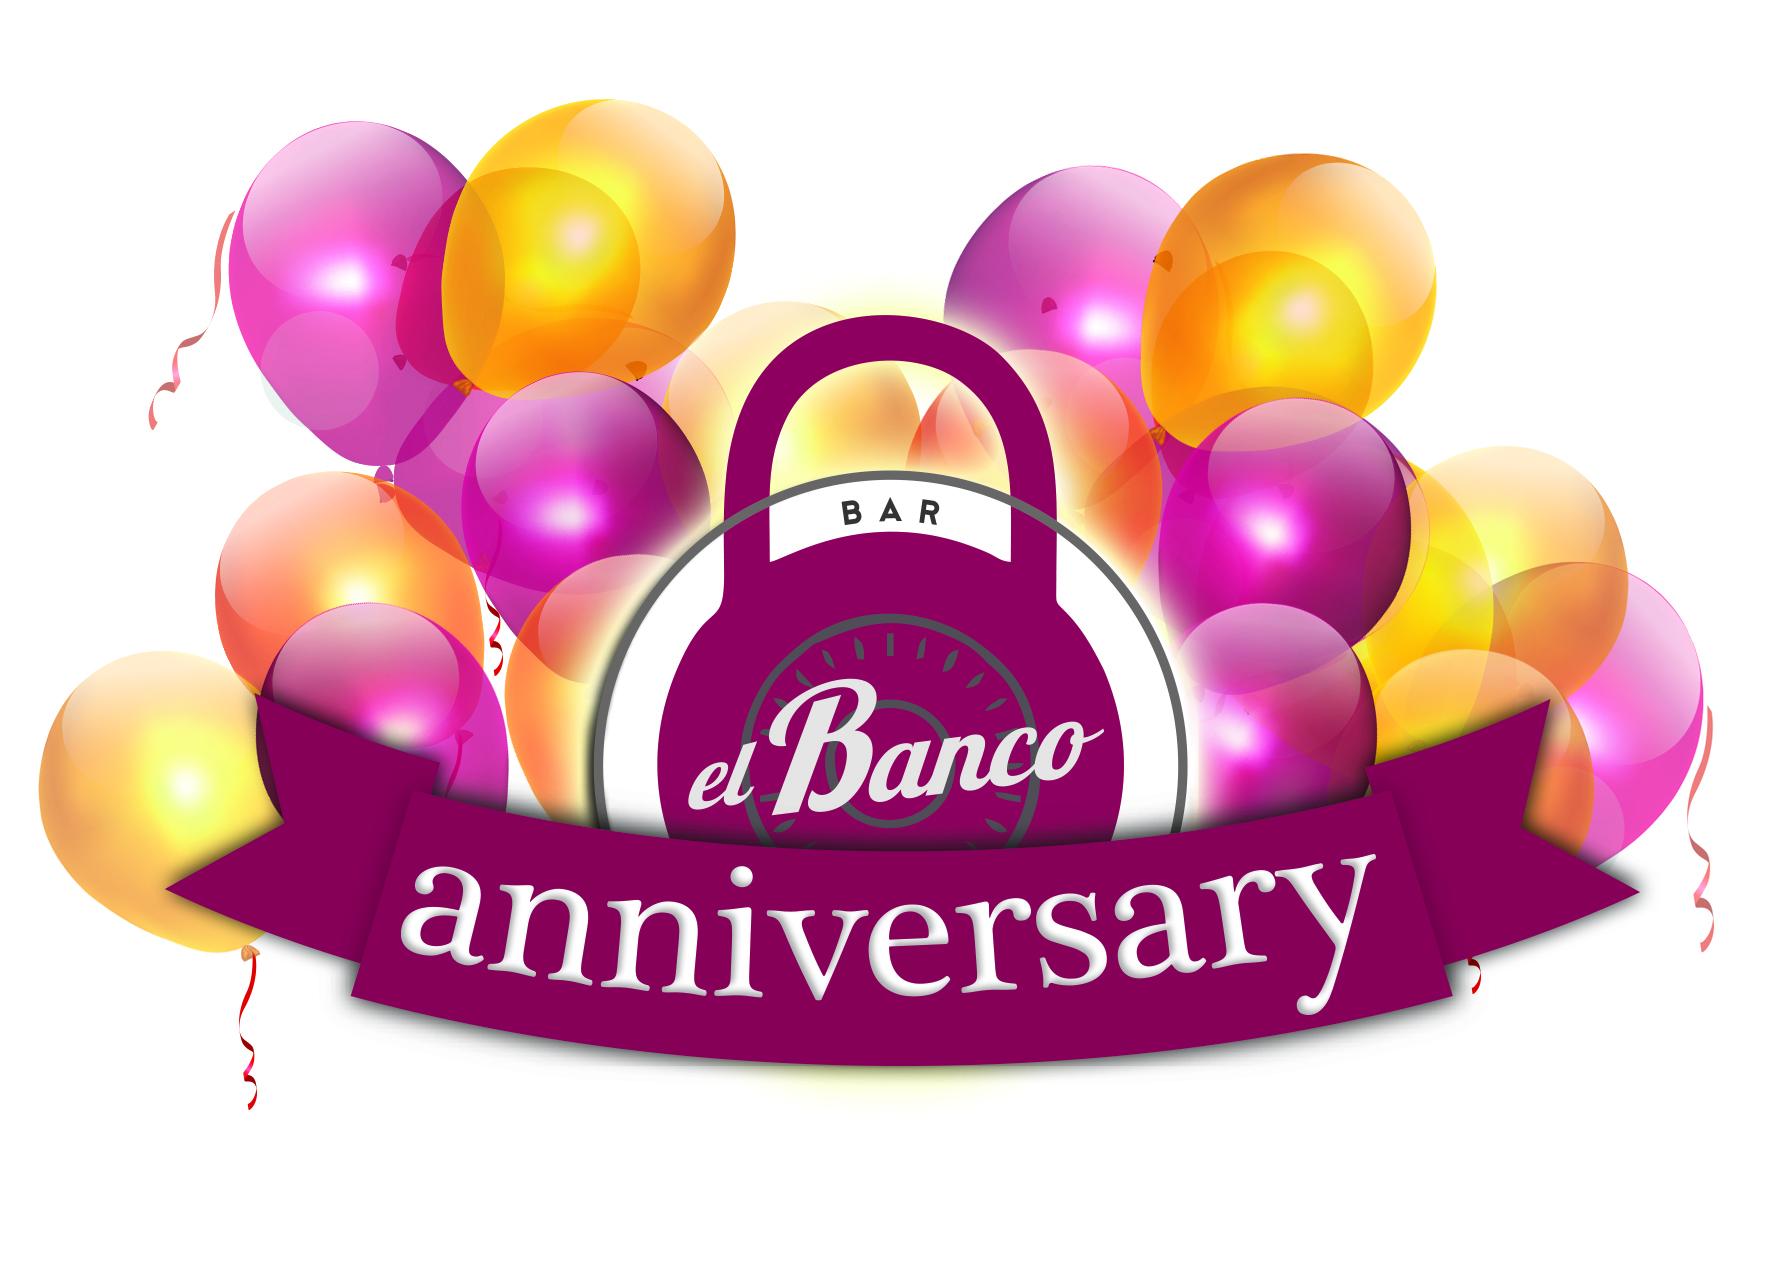 Restaurante el banco celebrates 1st year anniversary in style